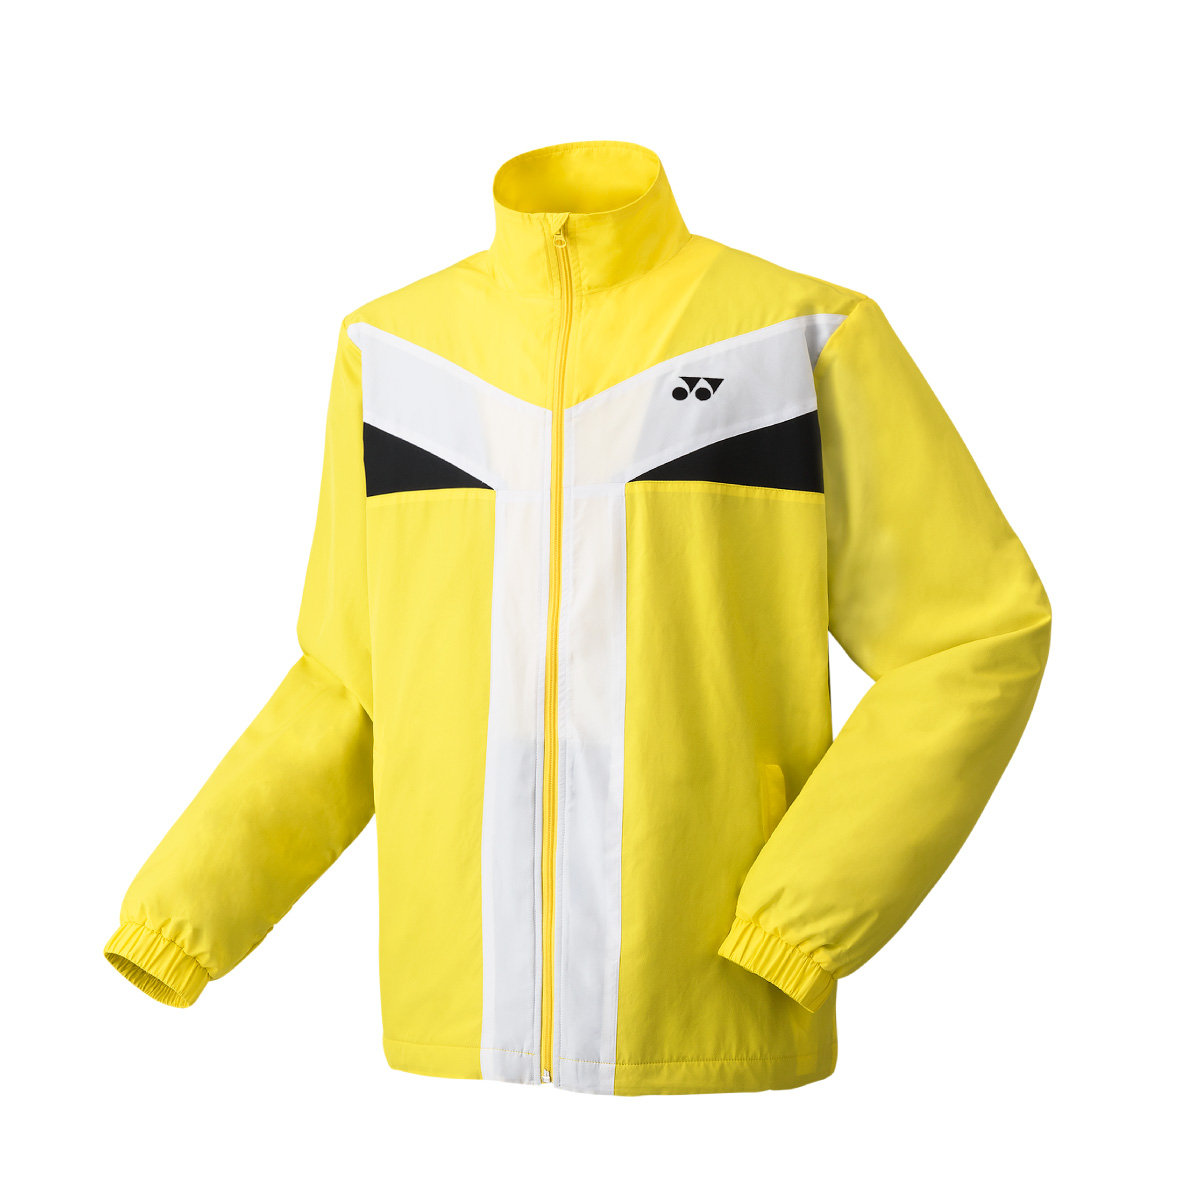 YONEX - Men's Warm-up Jacket, Club Team #YM0020Detailbild - 2